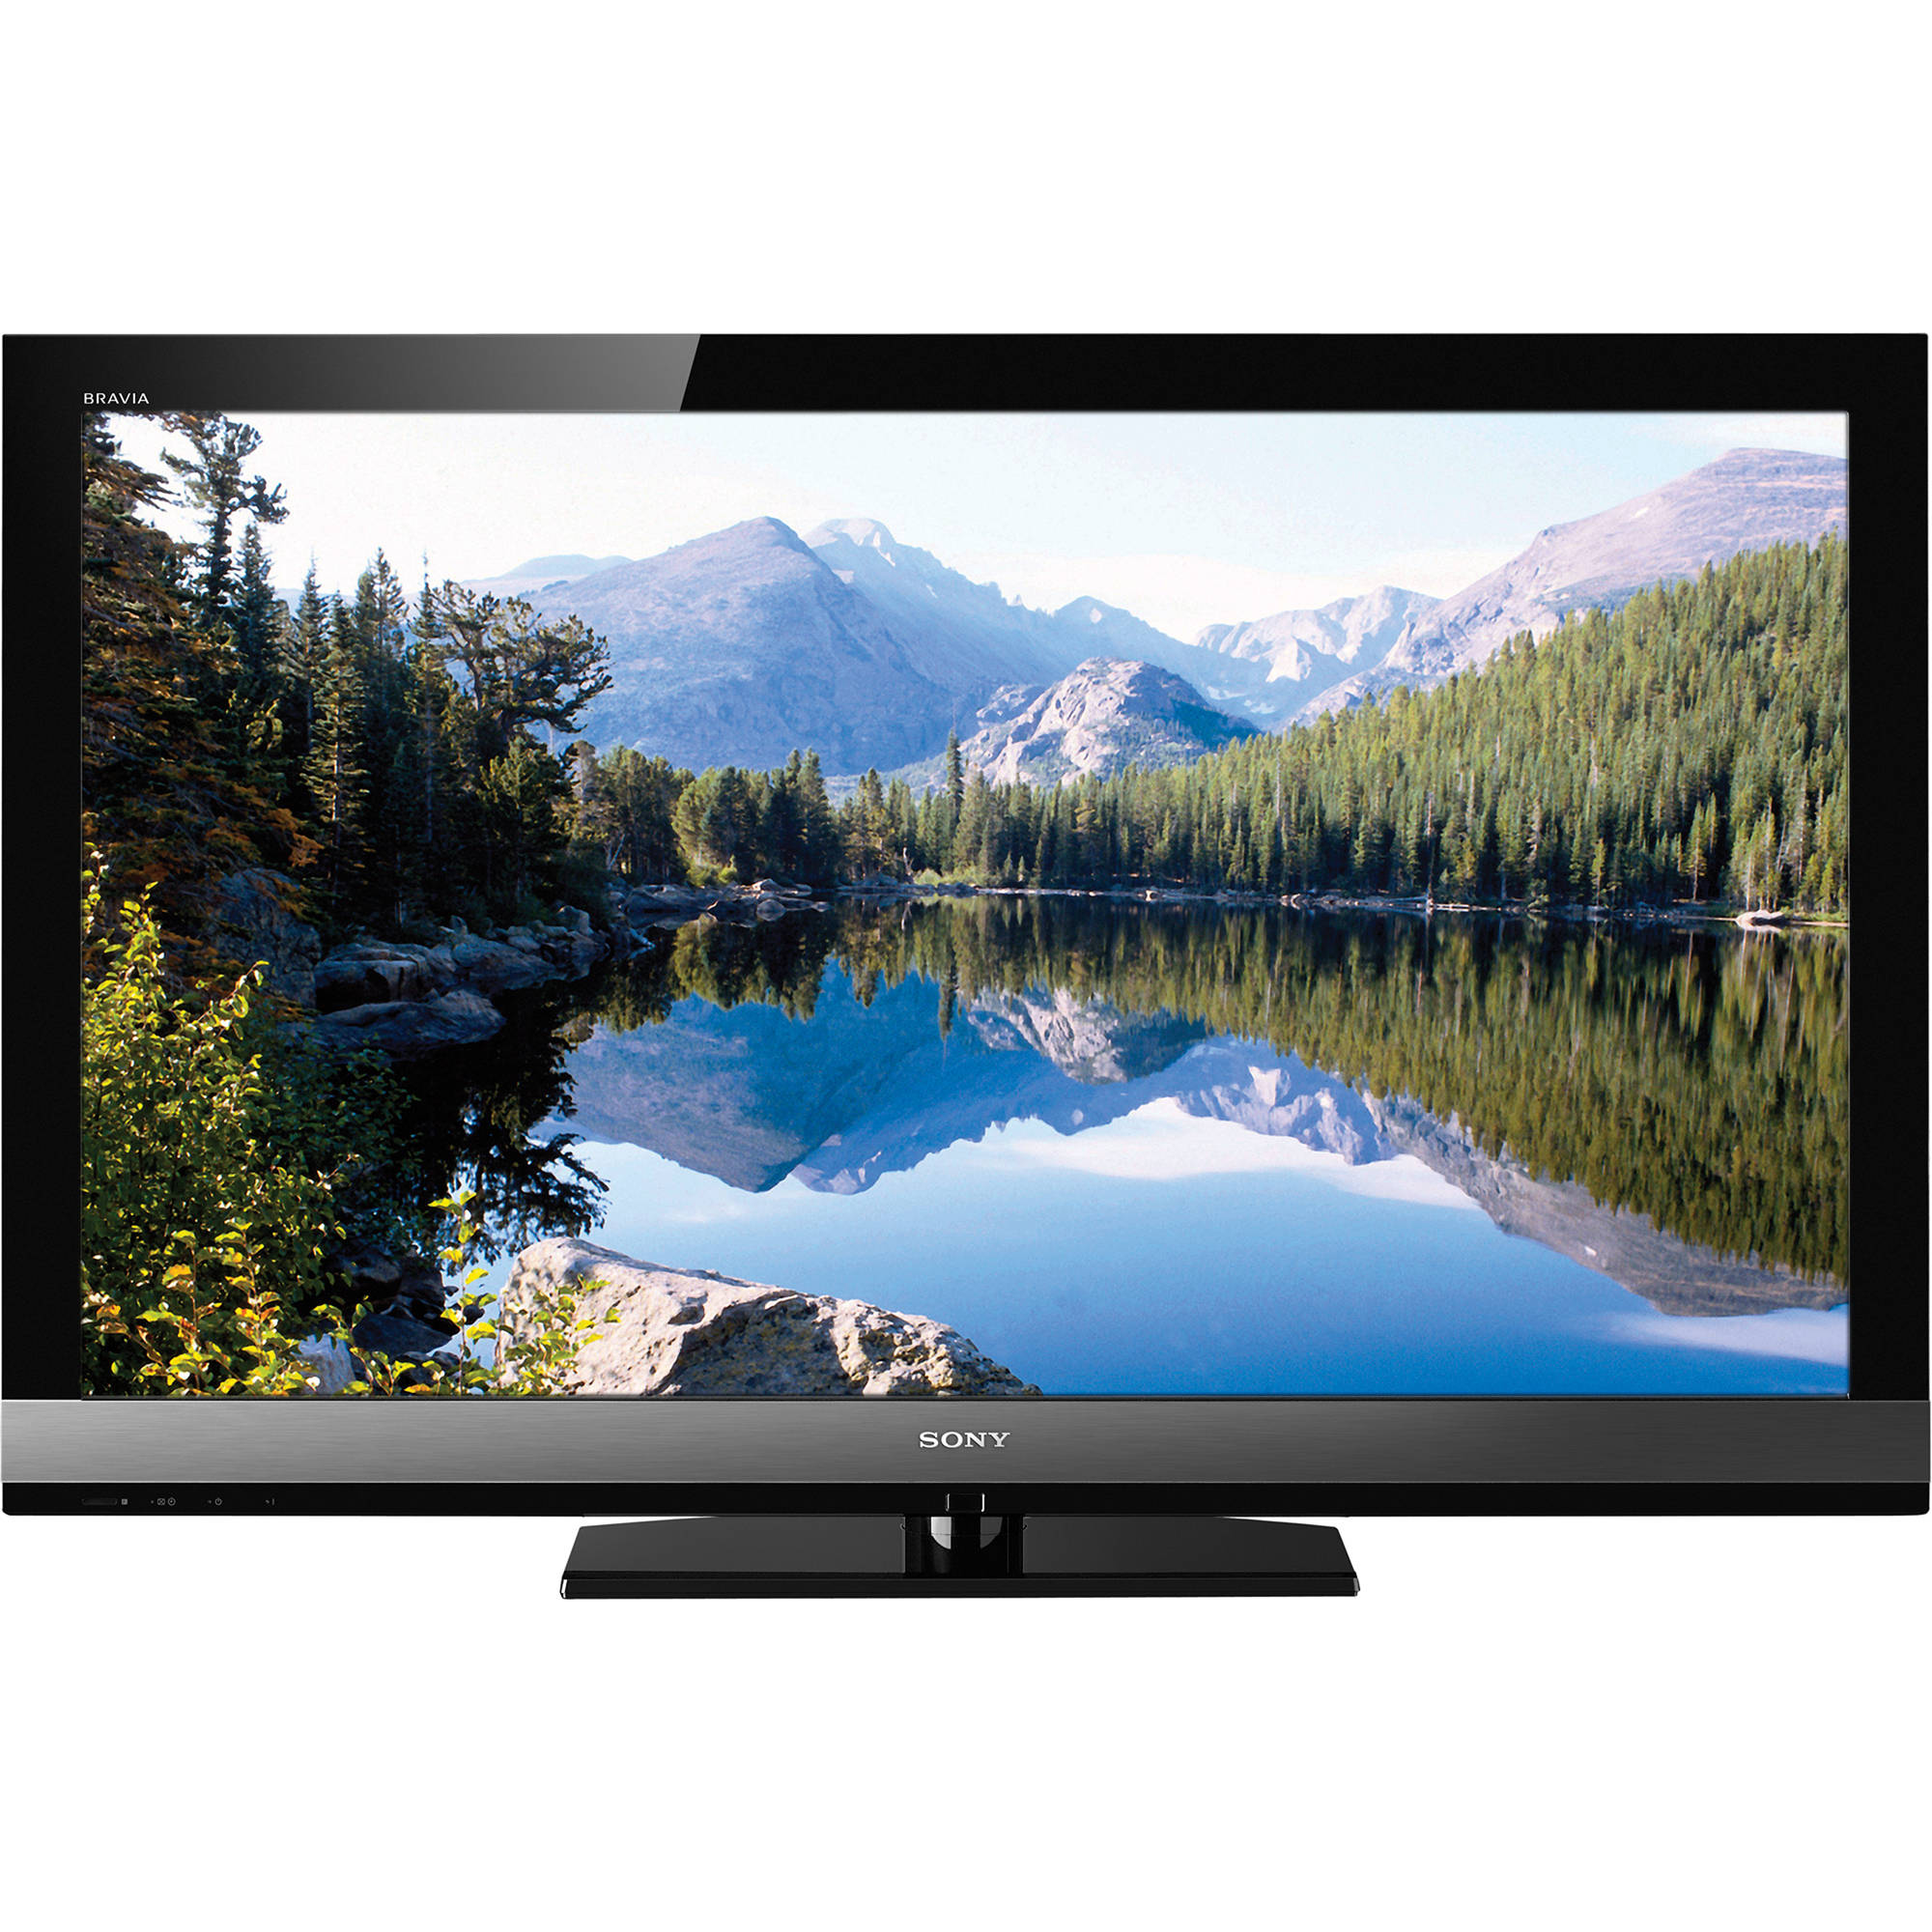 Sony KDL-32EX726 BRAVIA HDTV Driver Download (2019)